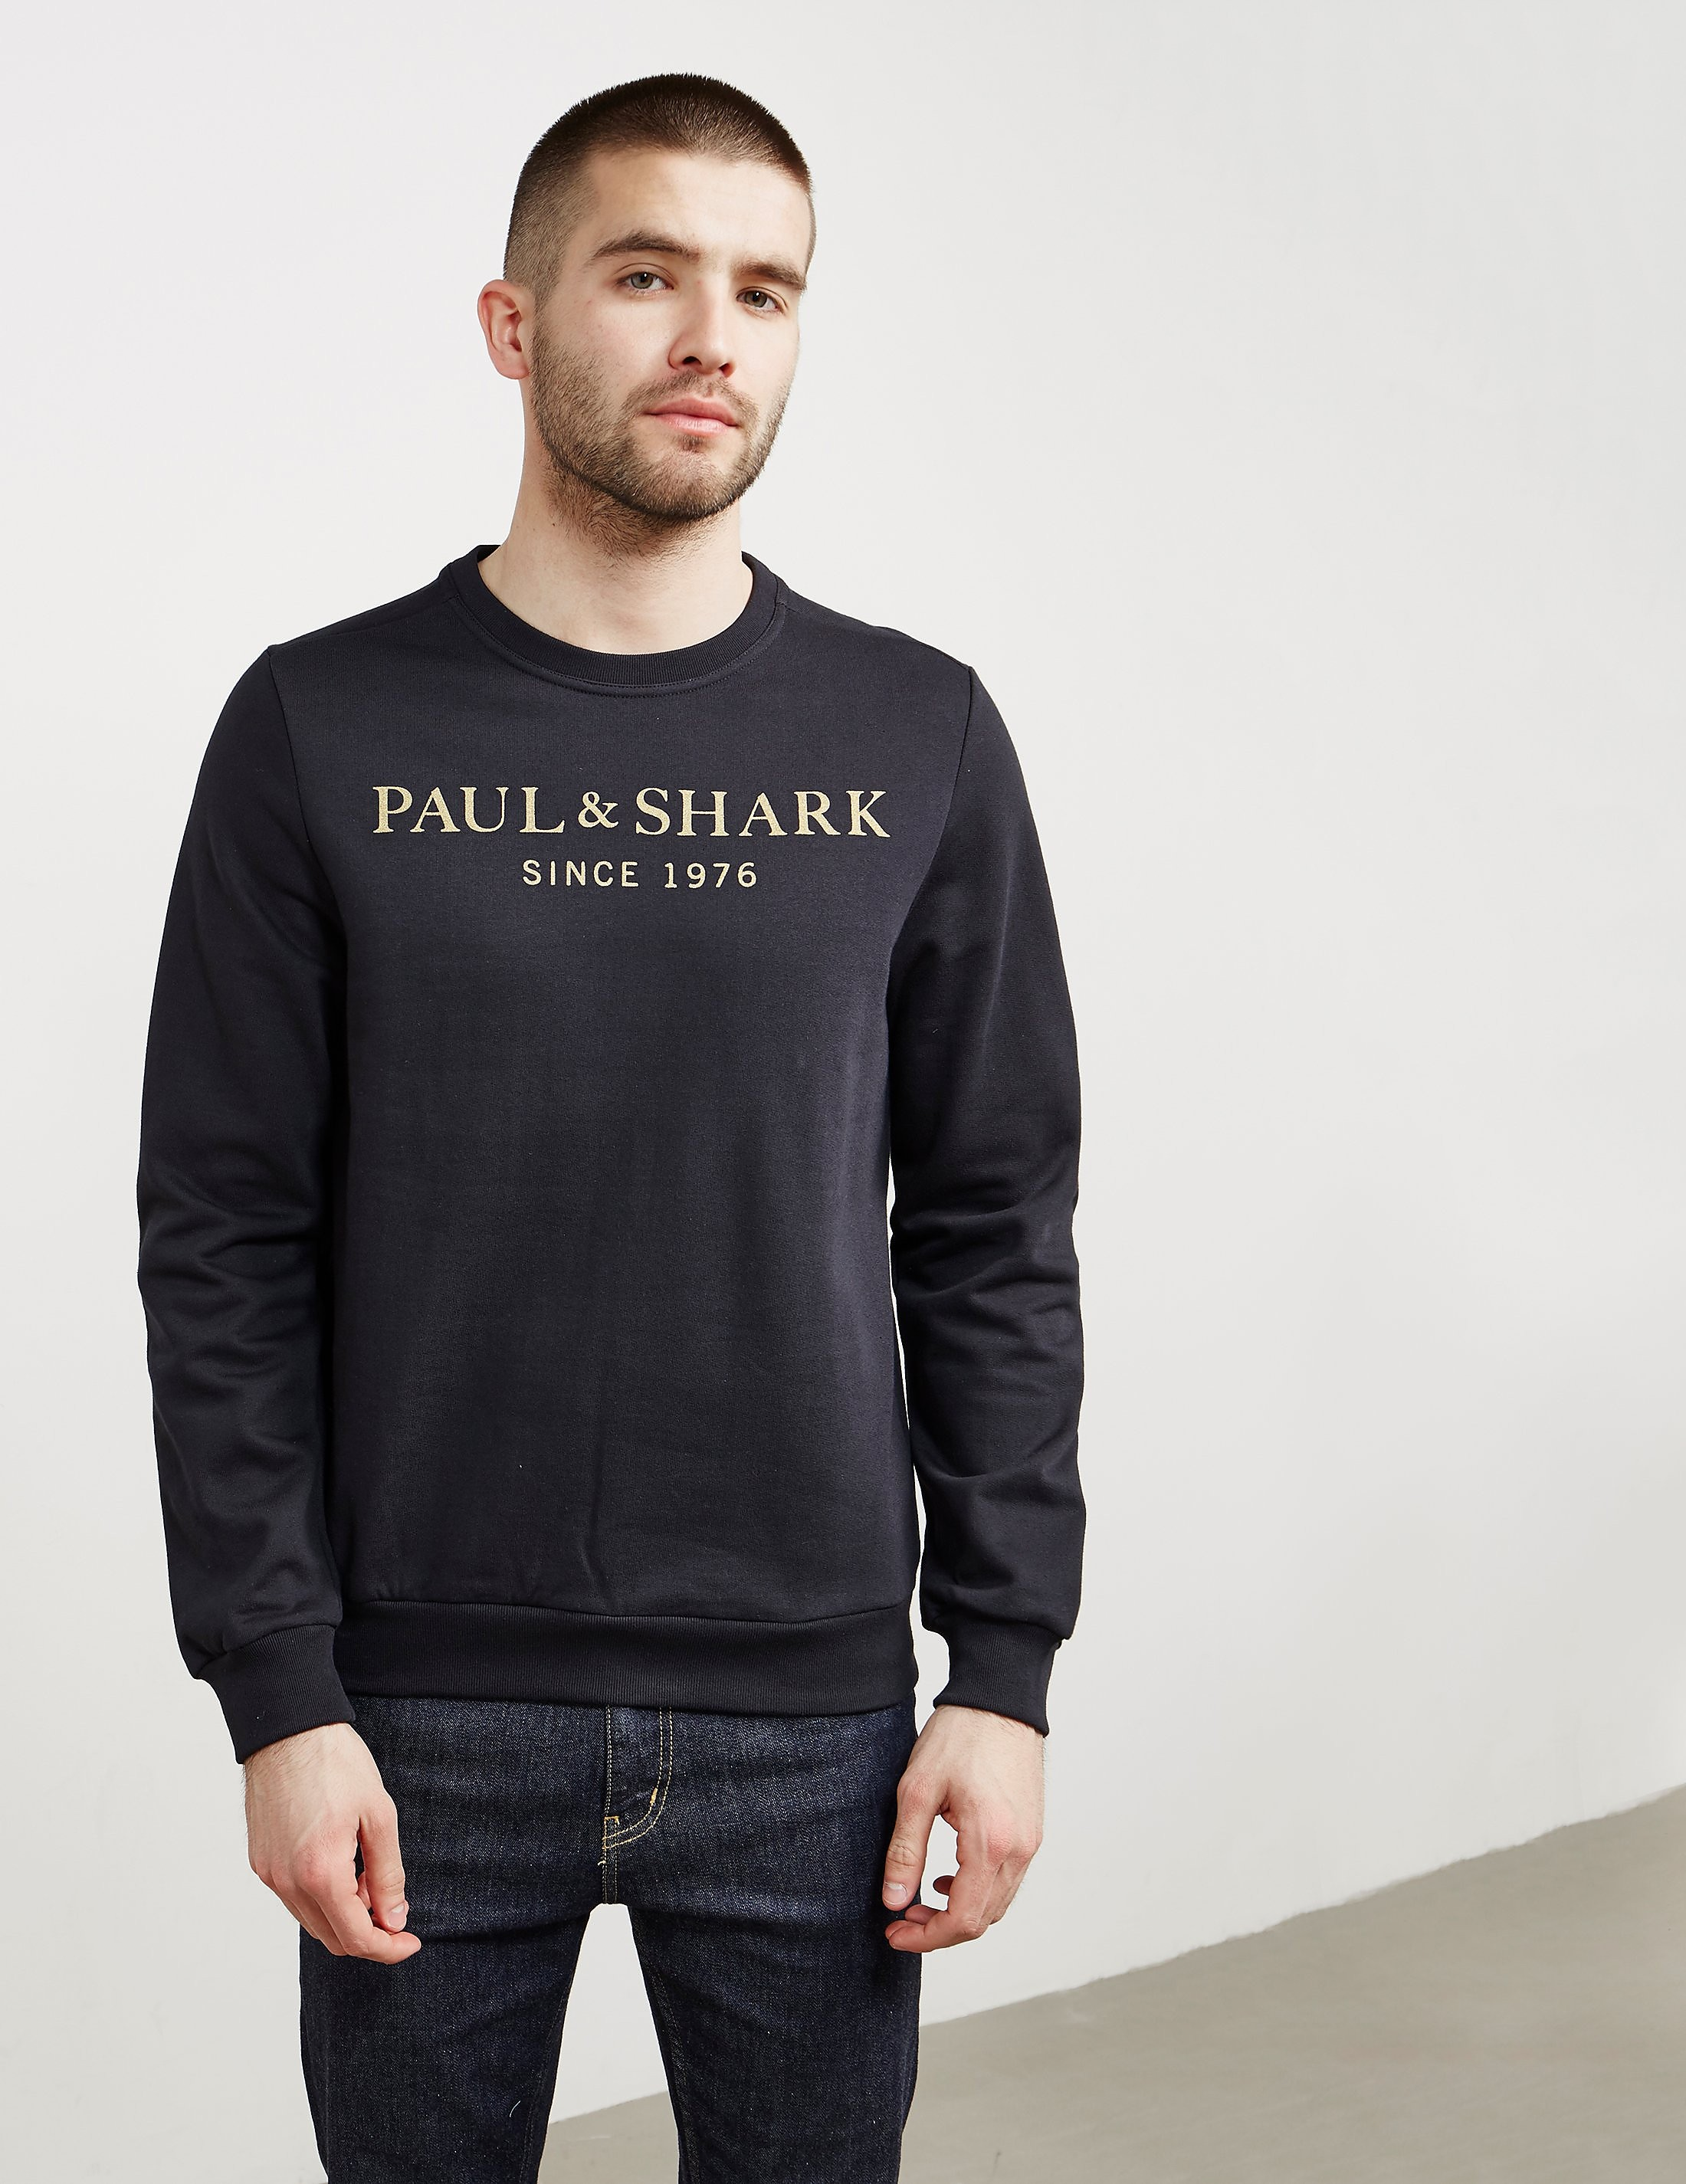 Paul and Shark Gold Logo Crew Sweatshirt - Exclusive